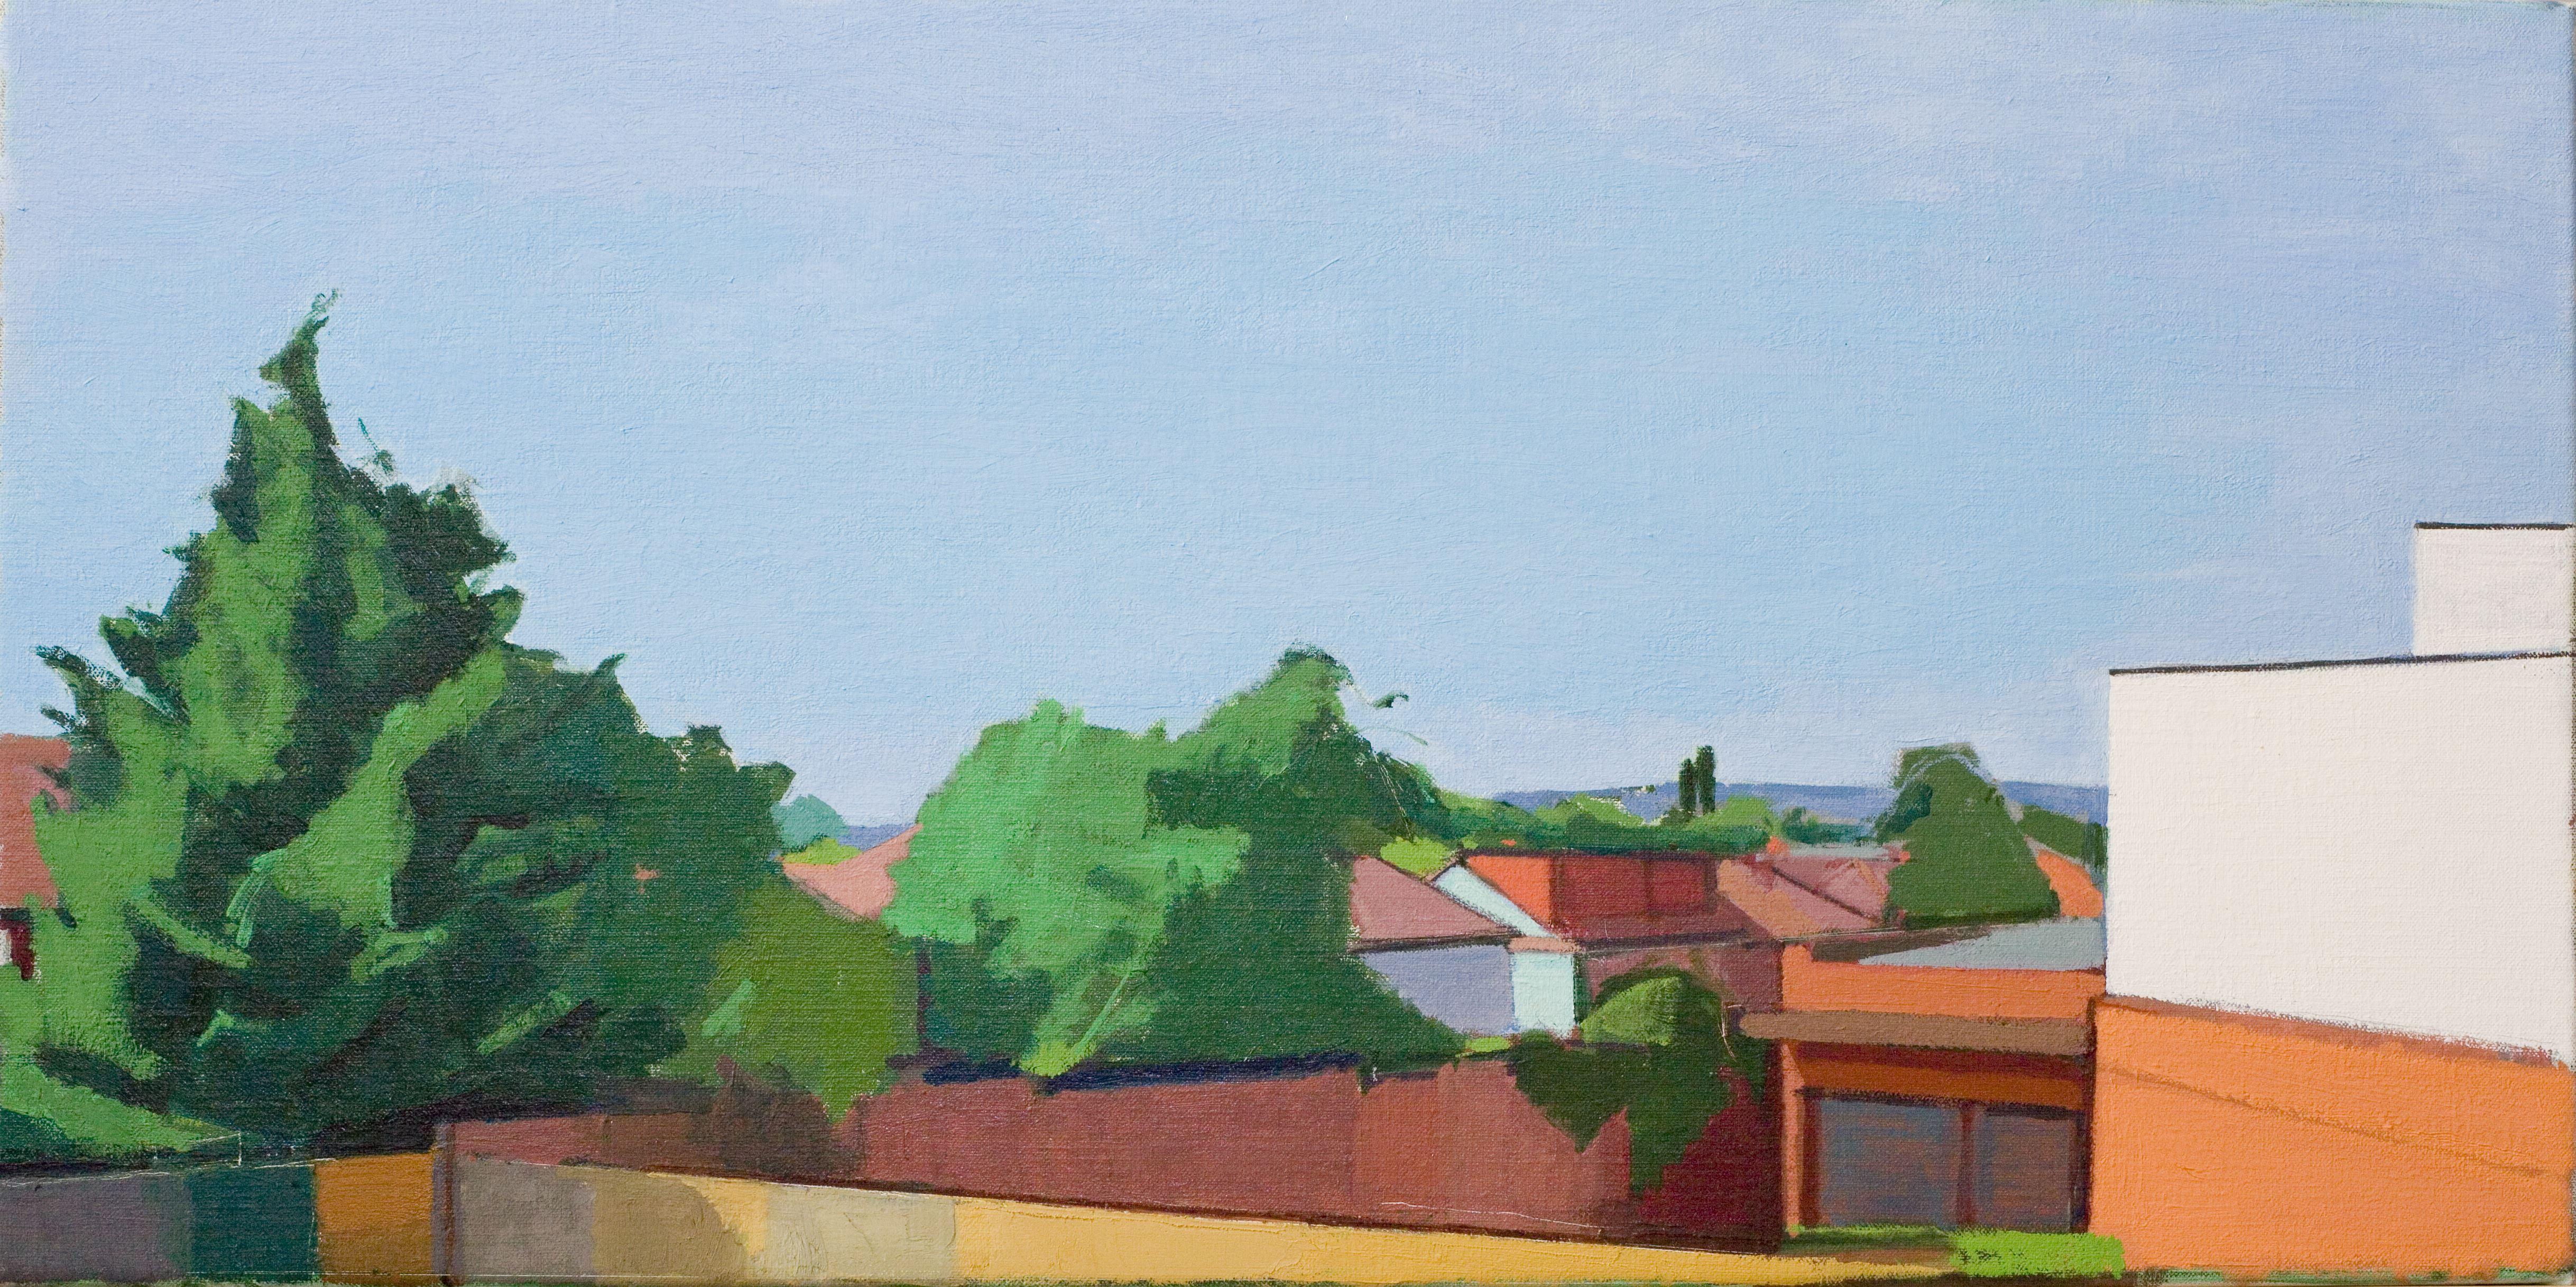 Horizon & Sky, 2014